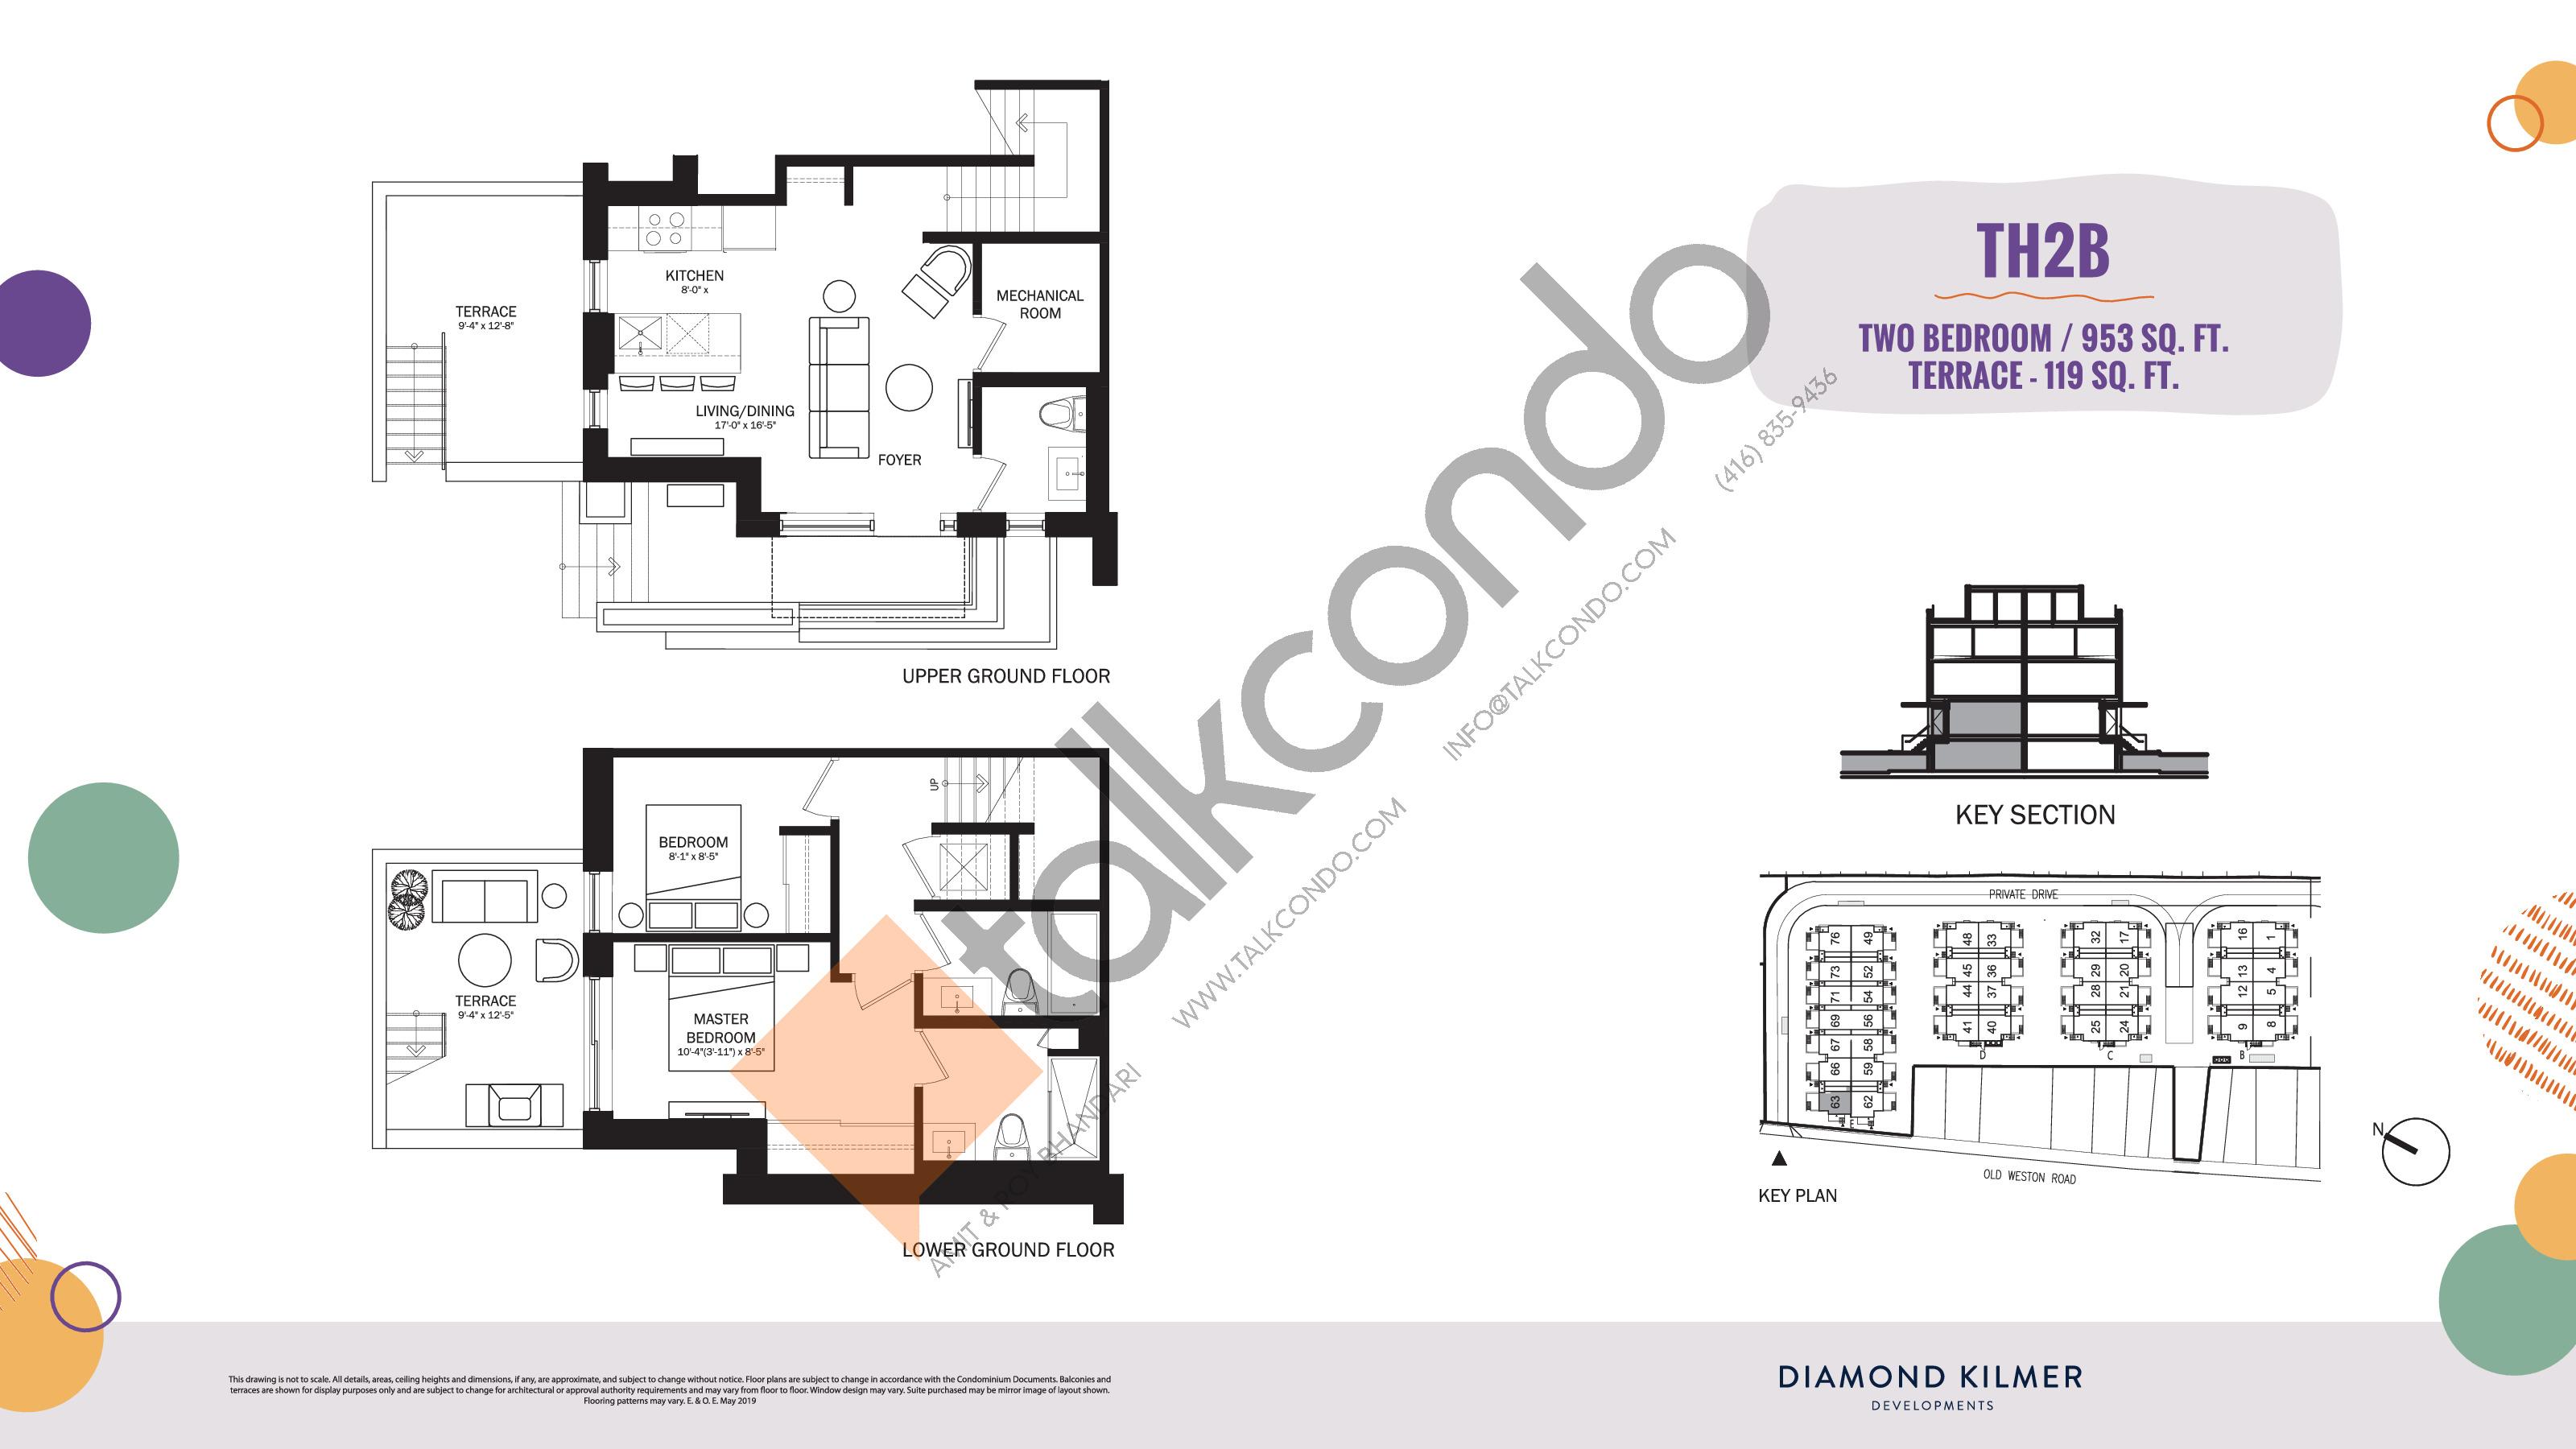 TH2B Floor Plan at Reunion Crossing Condos & Urban Towns - 953 sq.ft